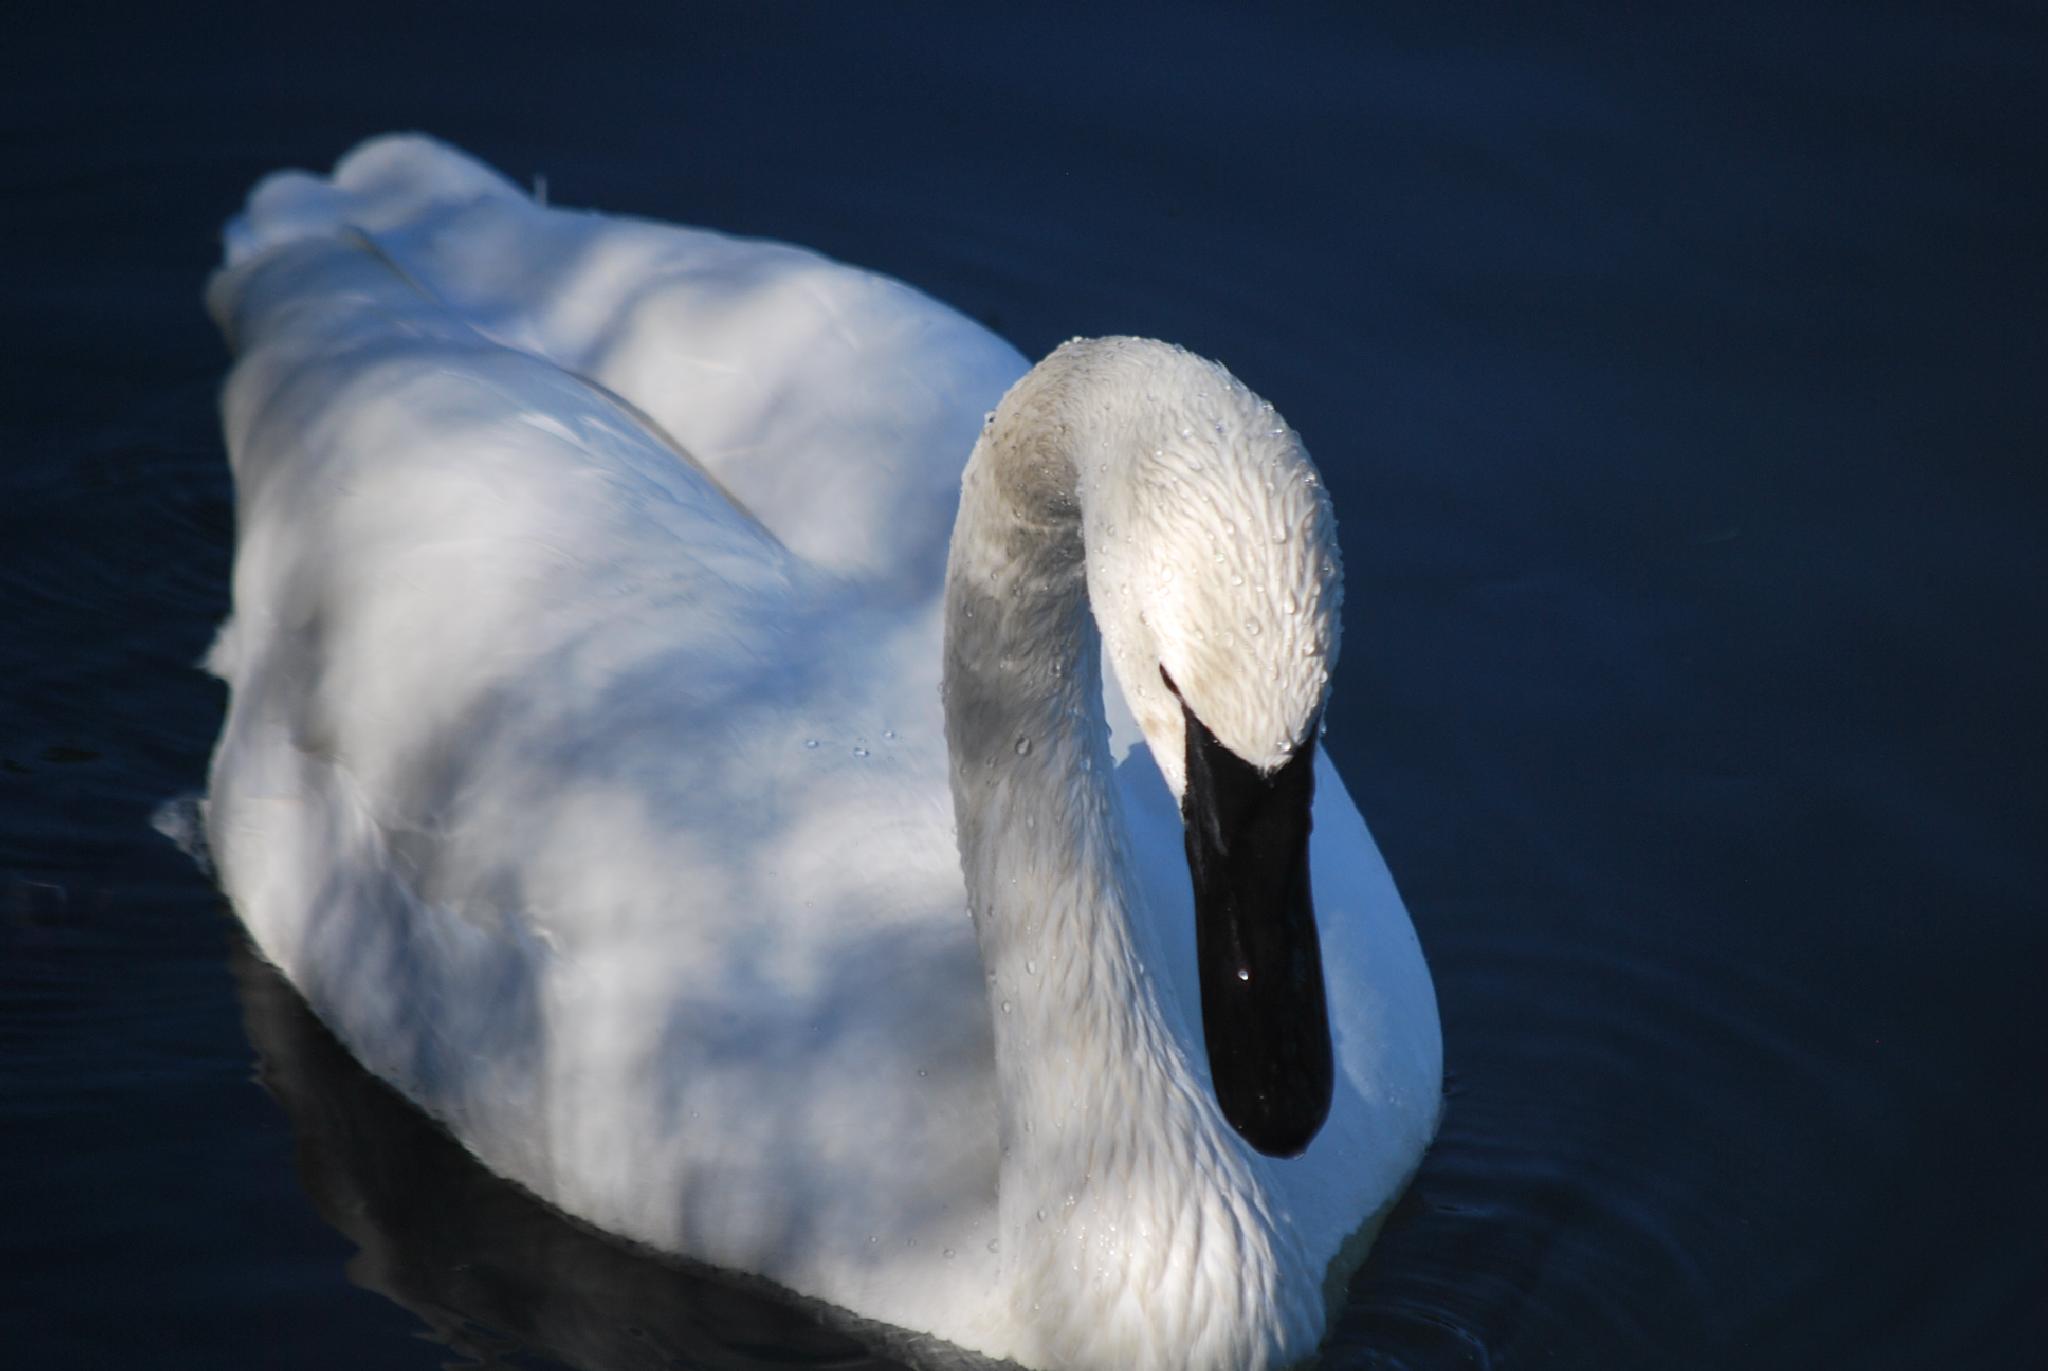 Swan in shadow by marilyn wirtz